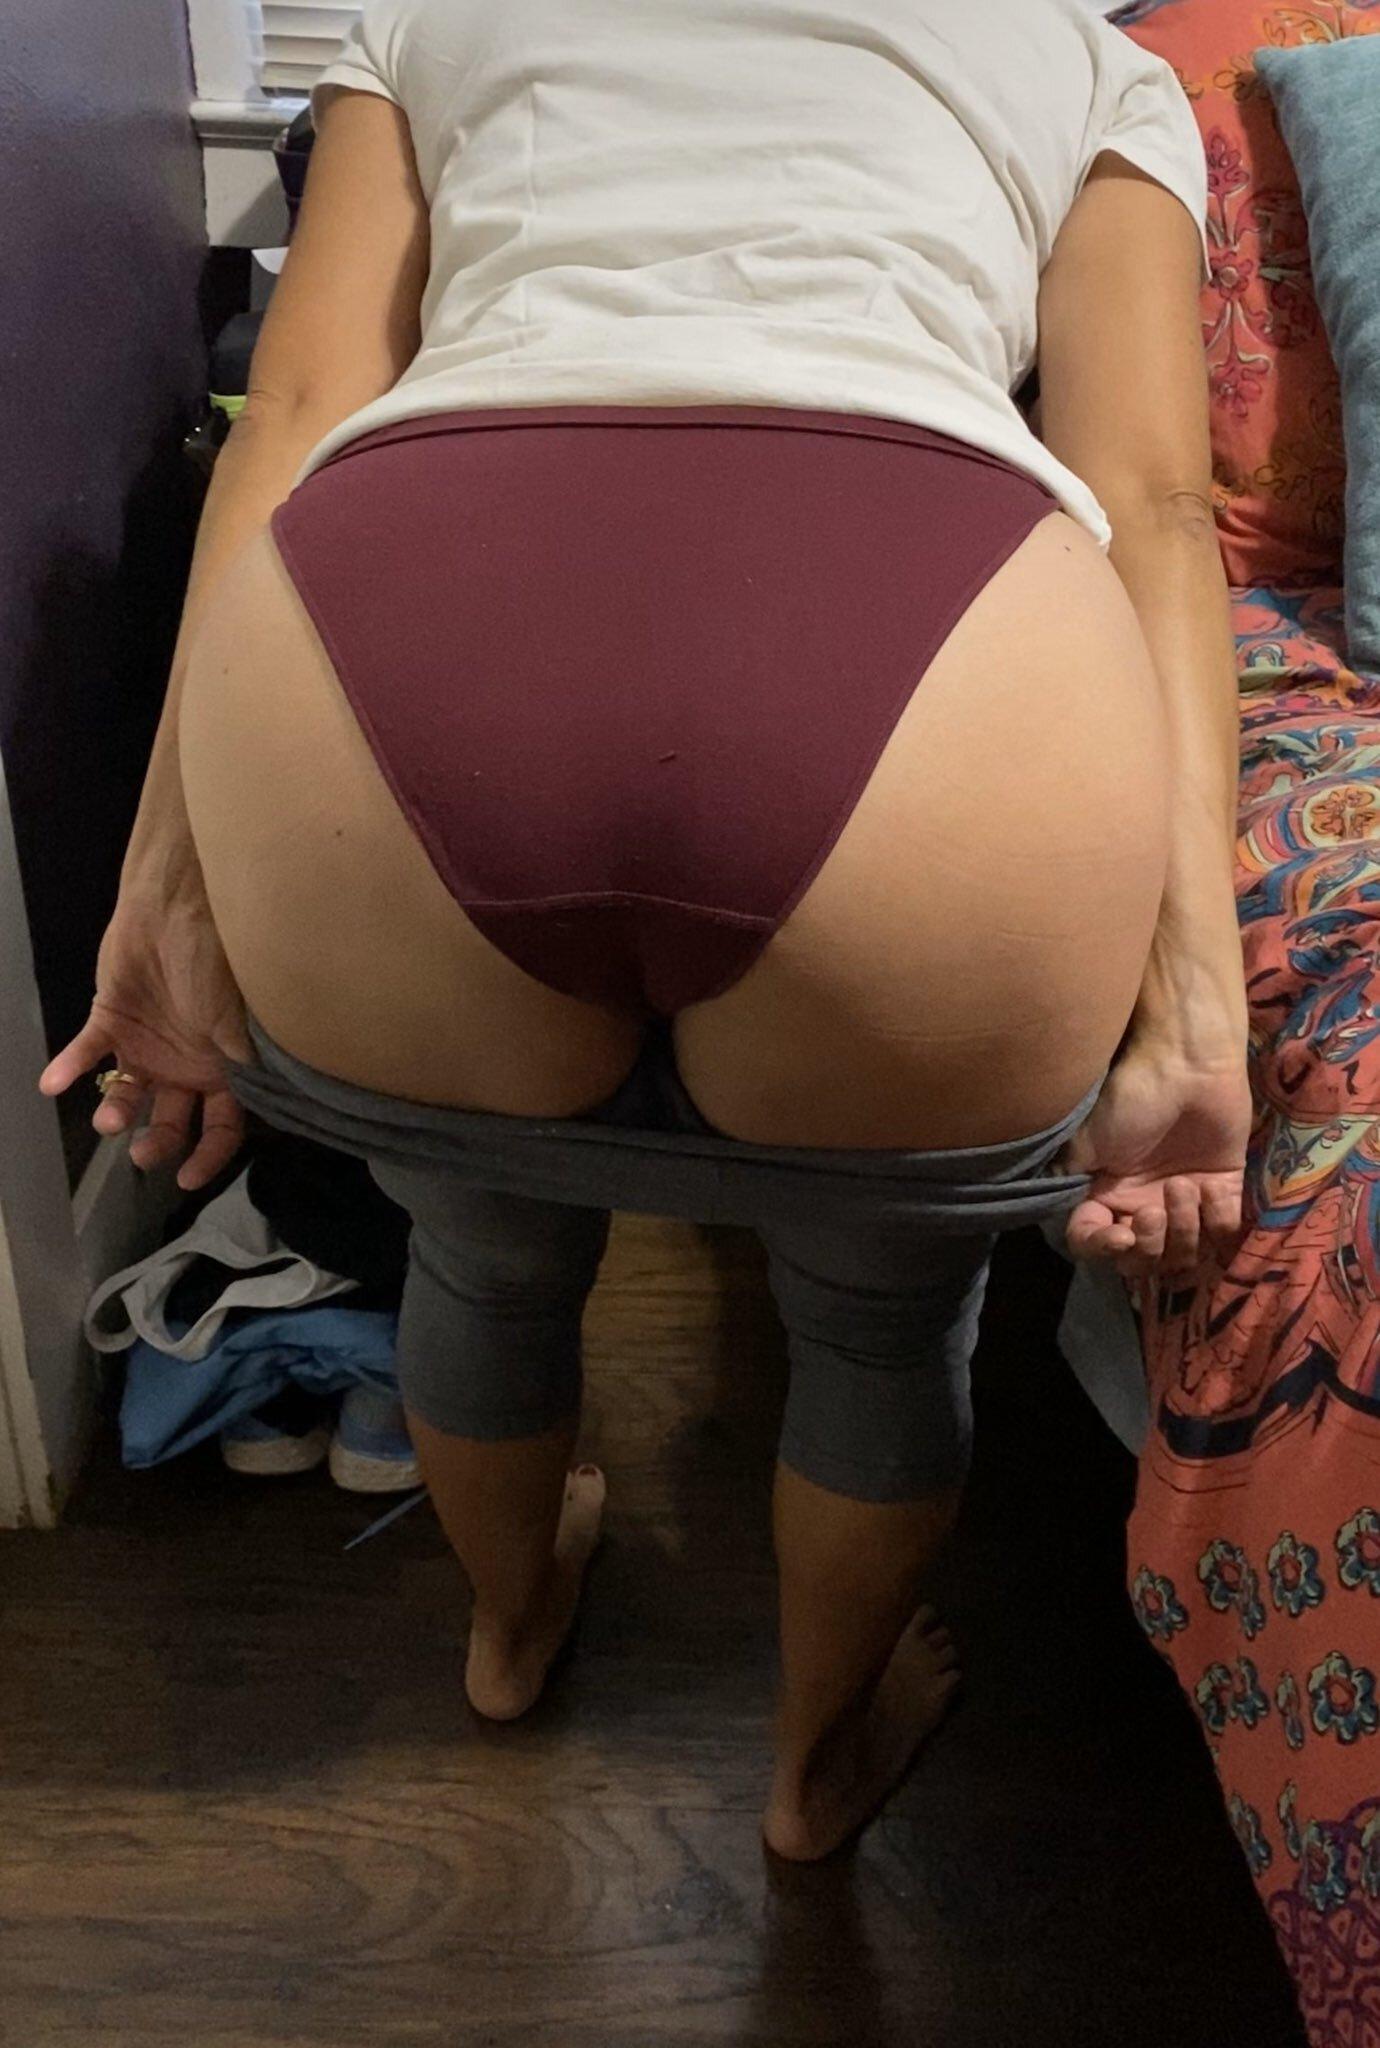 Fotos de Puticaseras, fotos porno caseroas, imagenes xxx amateurs